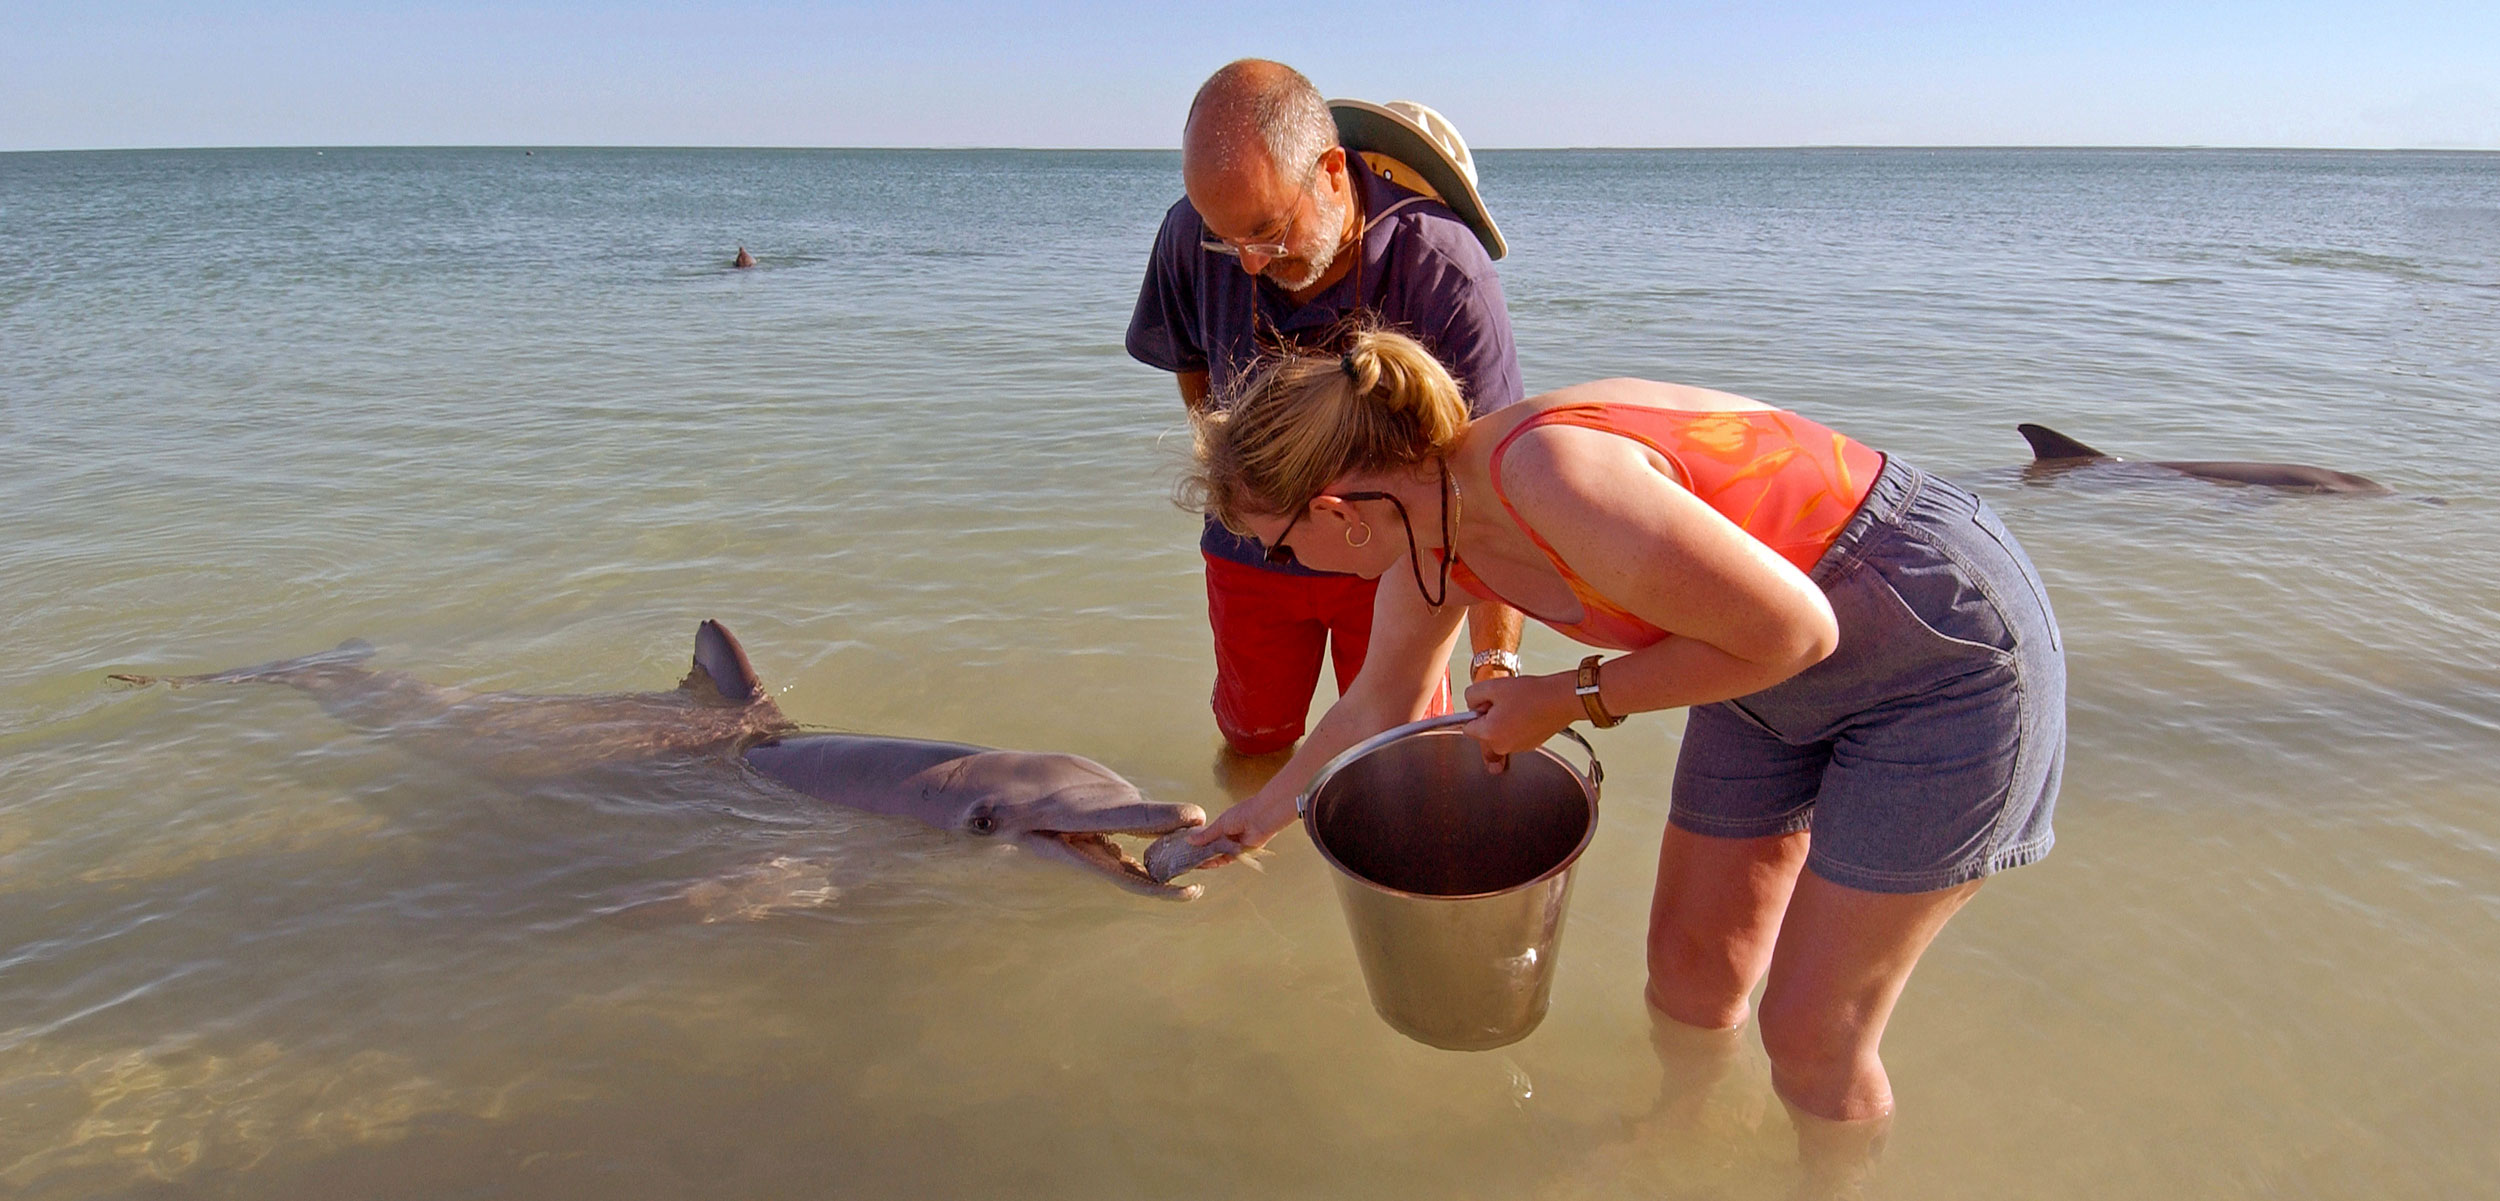 A tourist feeding fish to a Dolphin at Monkey Mia Dolphin Resort in Western Australia